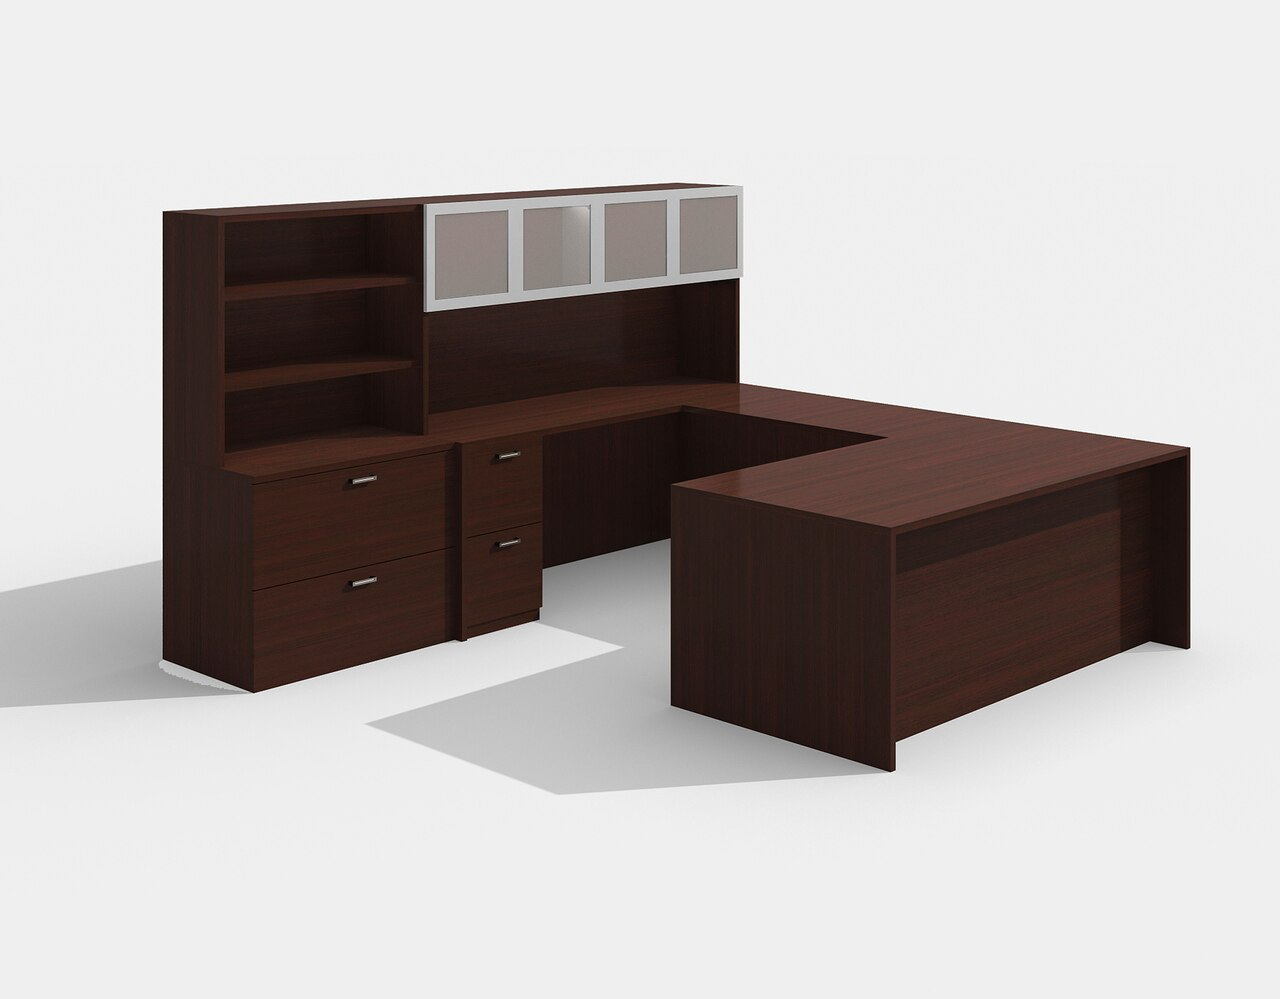 am-426n amber mahogany u desk with glass doors